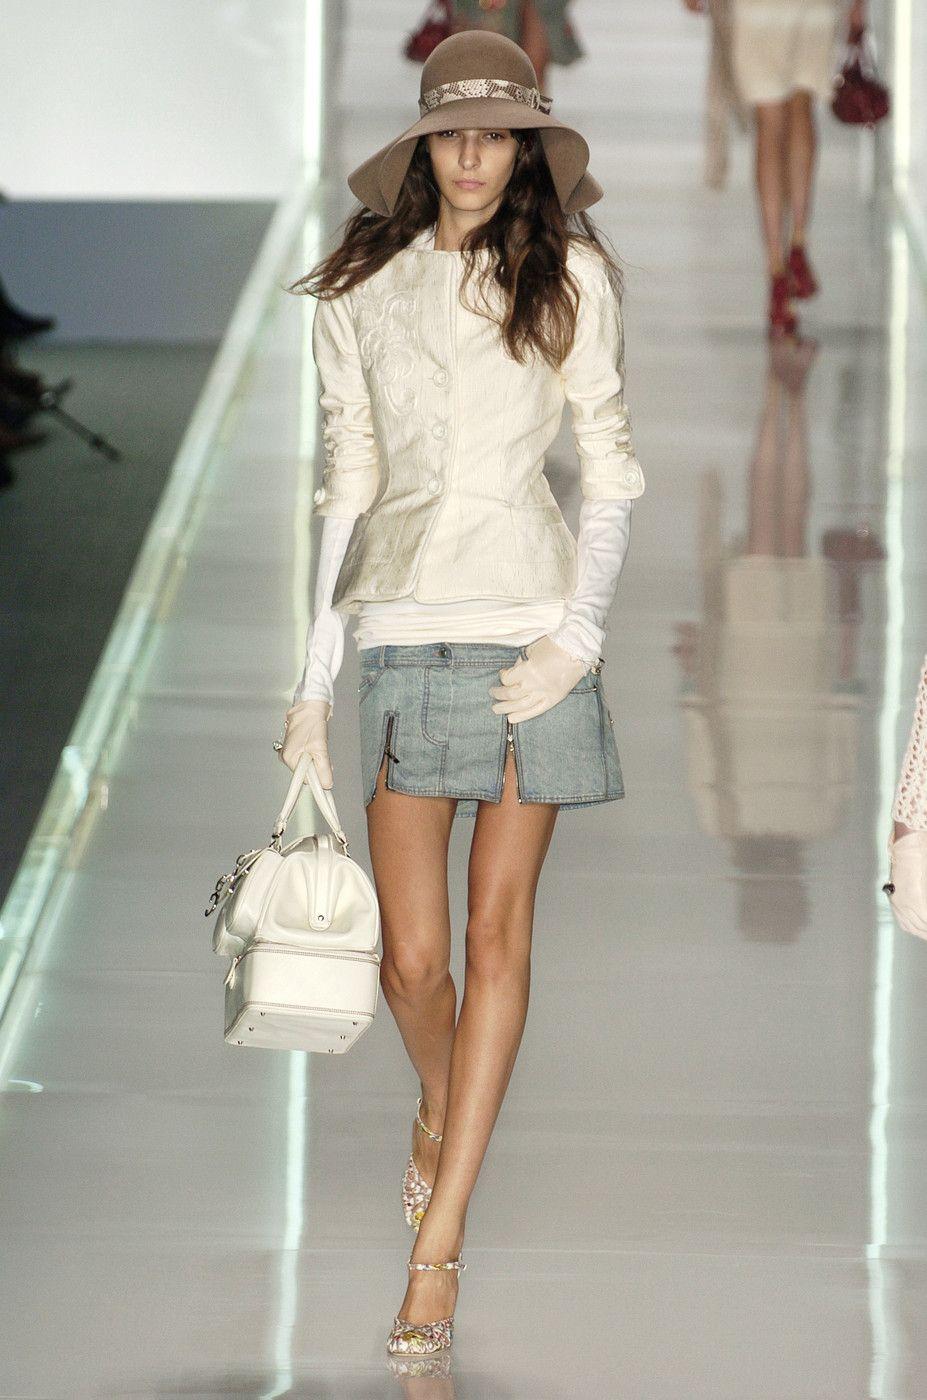 207 photos of Christian Dior at Paris Fashion Week Spring 2005.